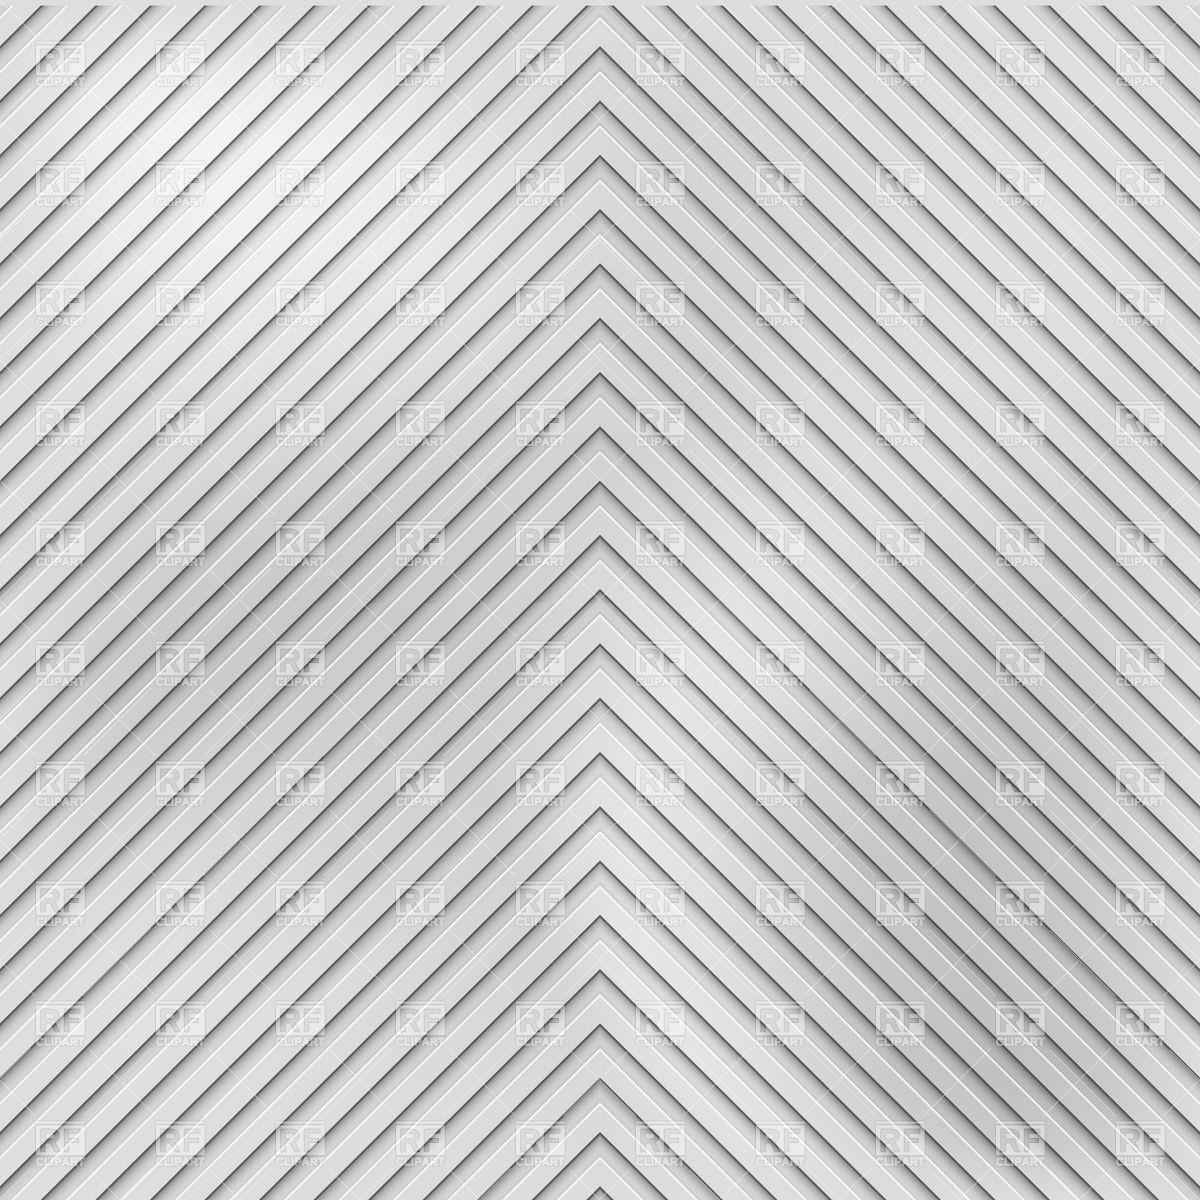 Grooved herringbone metallic background Vector Image #9320.